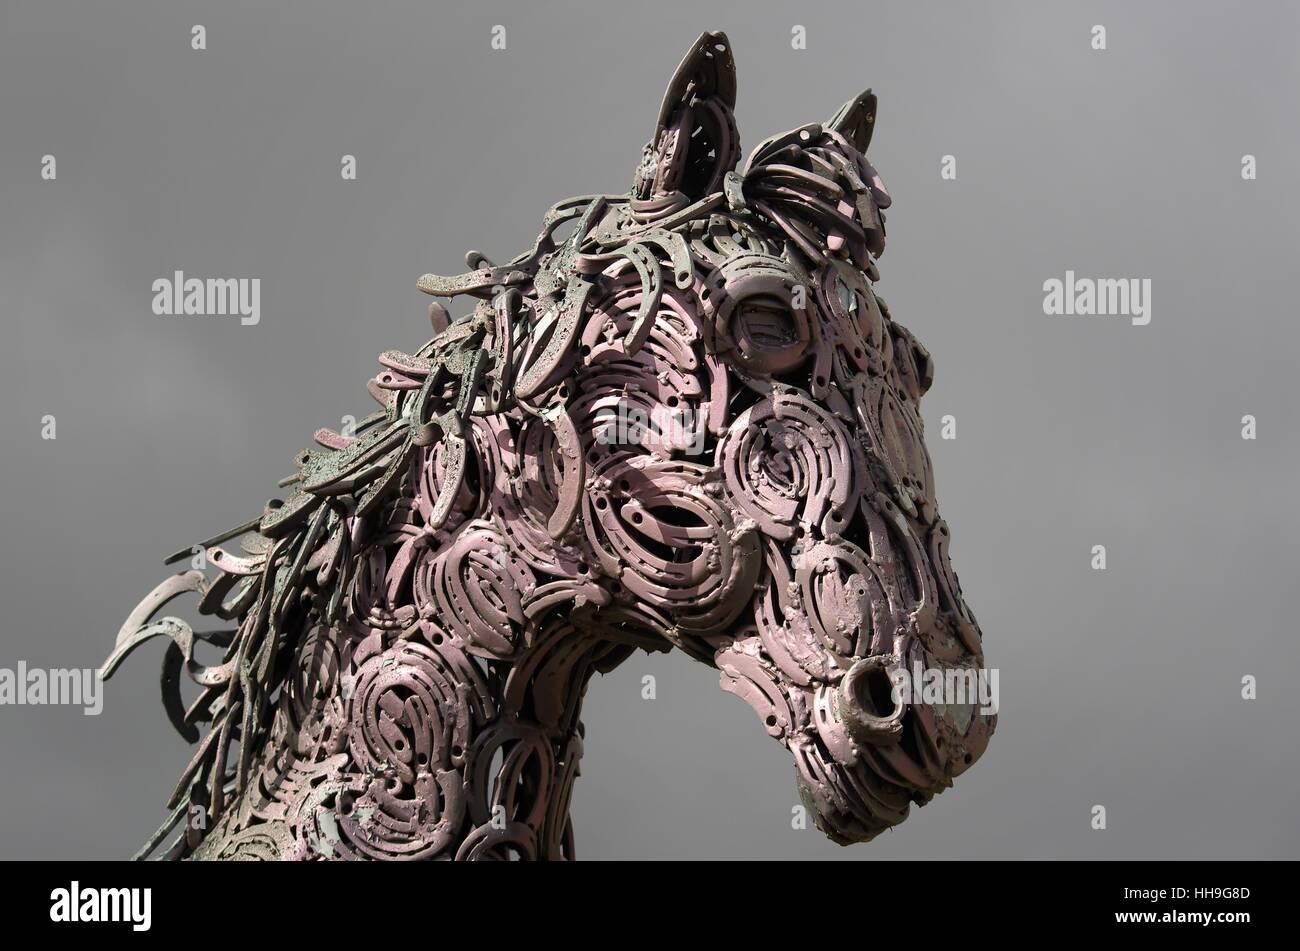 Art Work Of Art Horse Animal Sculpture Decor Riding Horseshoe Stock Photo Alamy